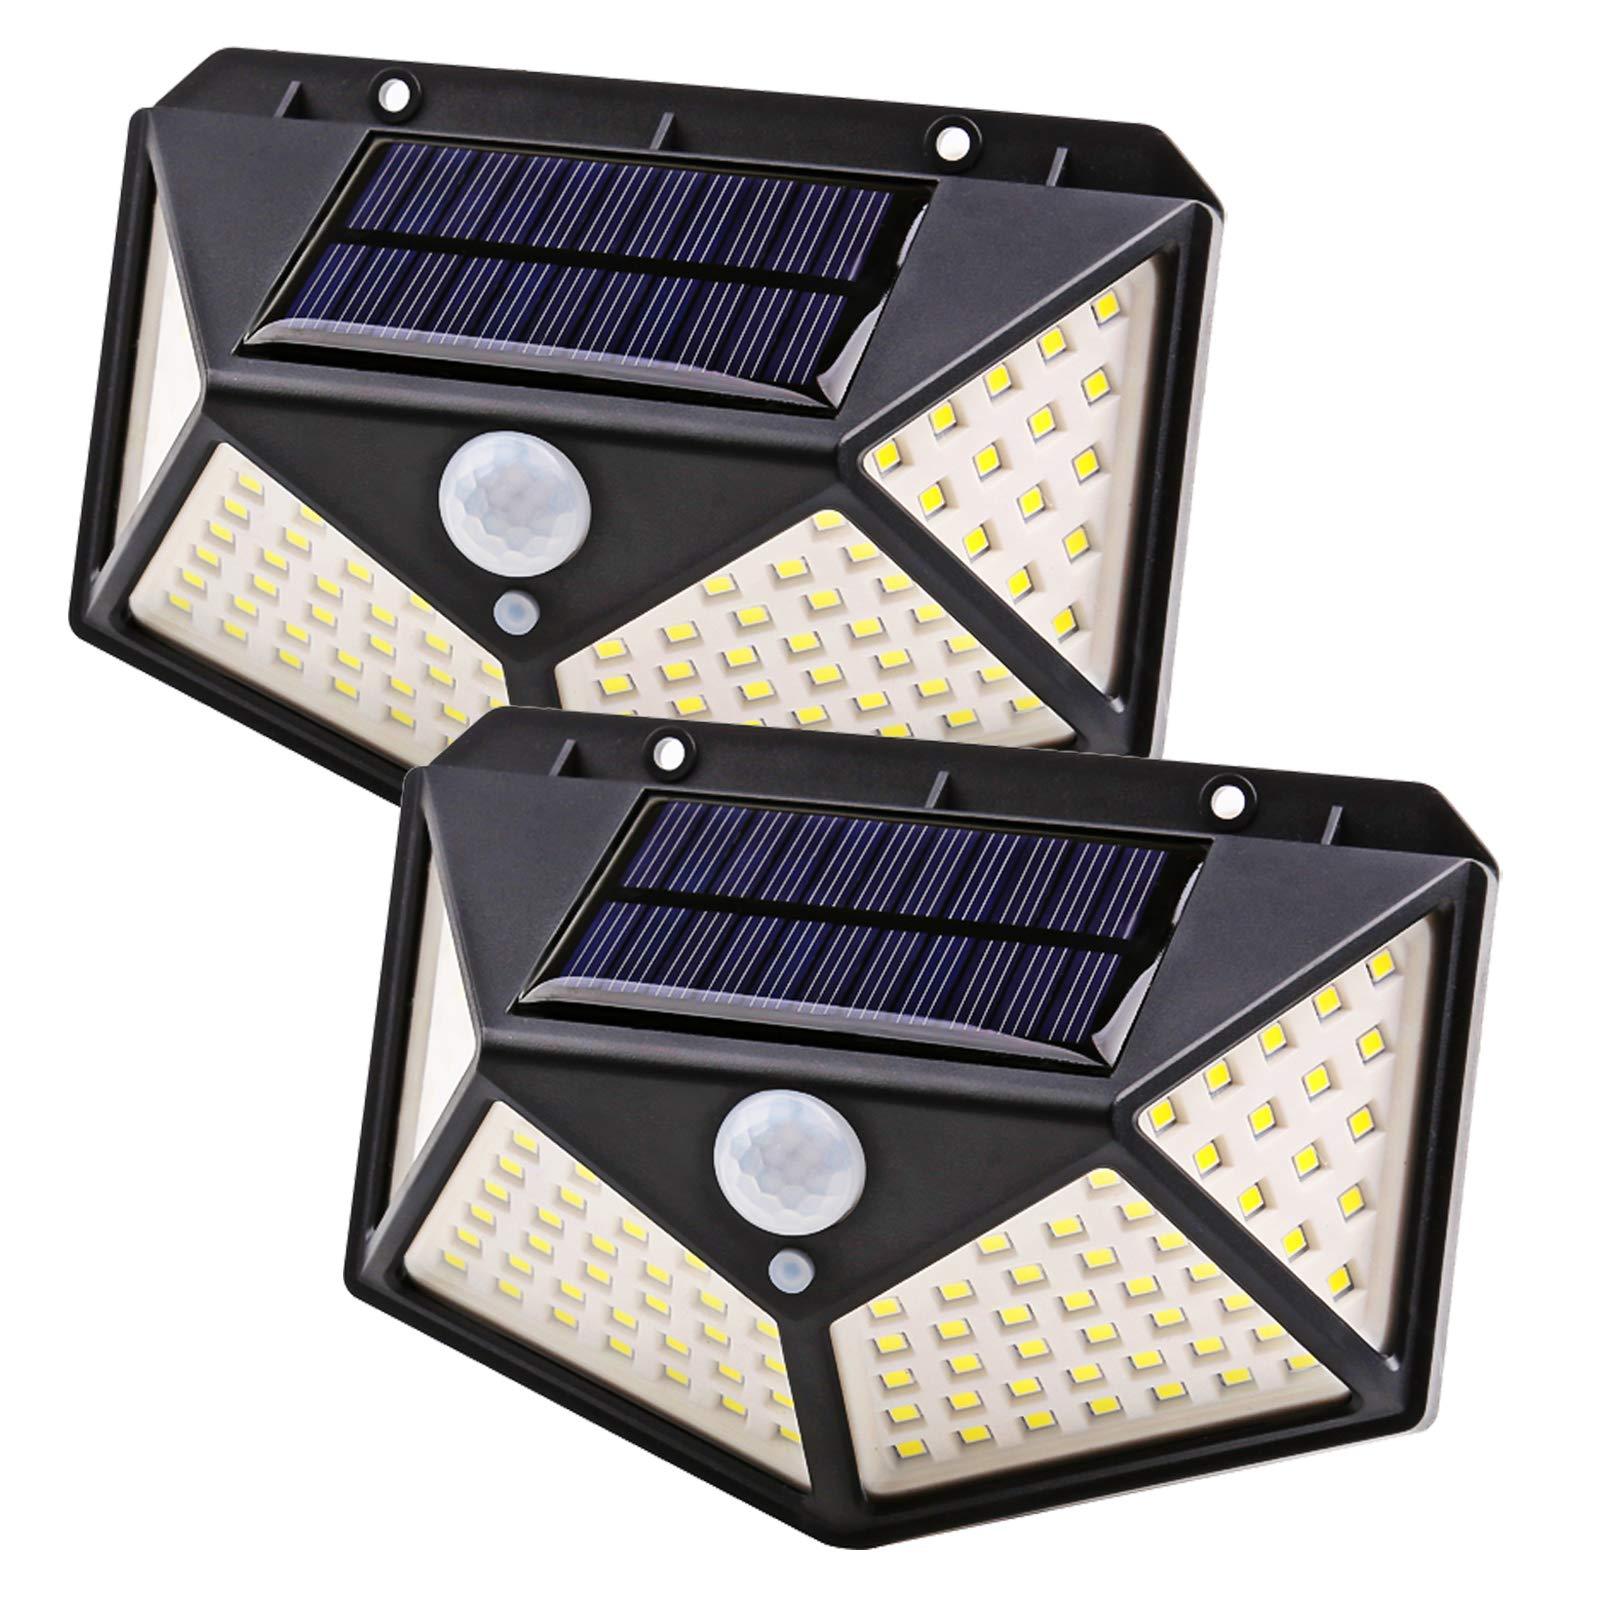 100 LED Solar Wall Lamp PIR Motion Sensor Light Outdoor Waterproof Garden Courtyard Solar Street Lights Lighting 3 Modes